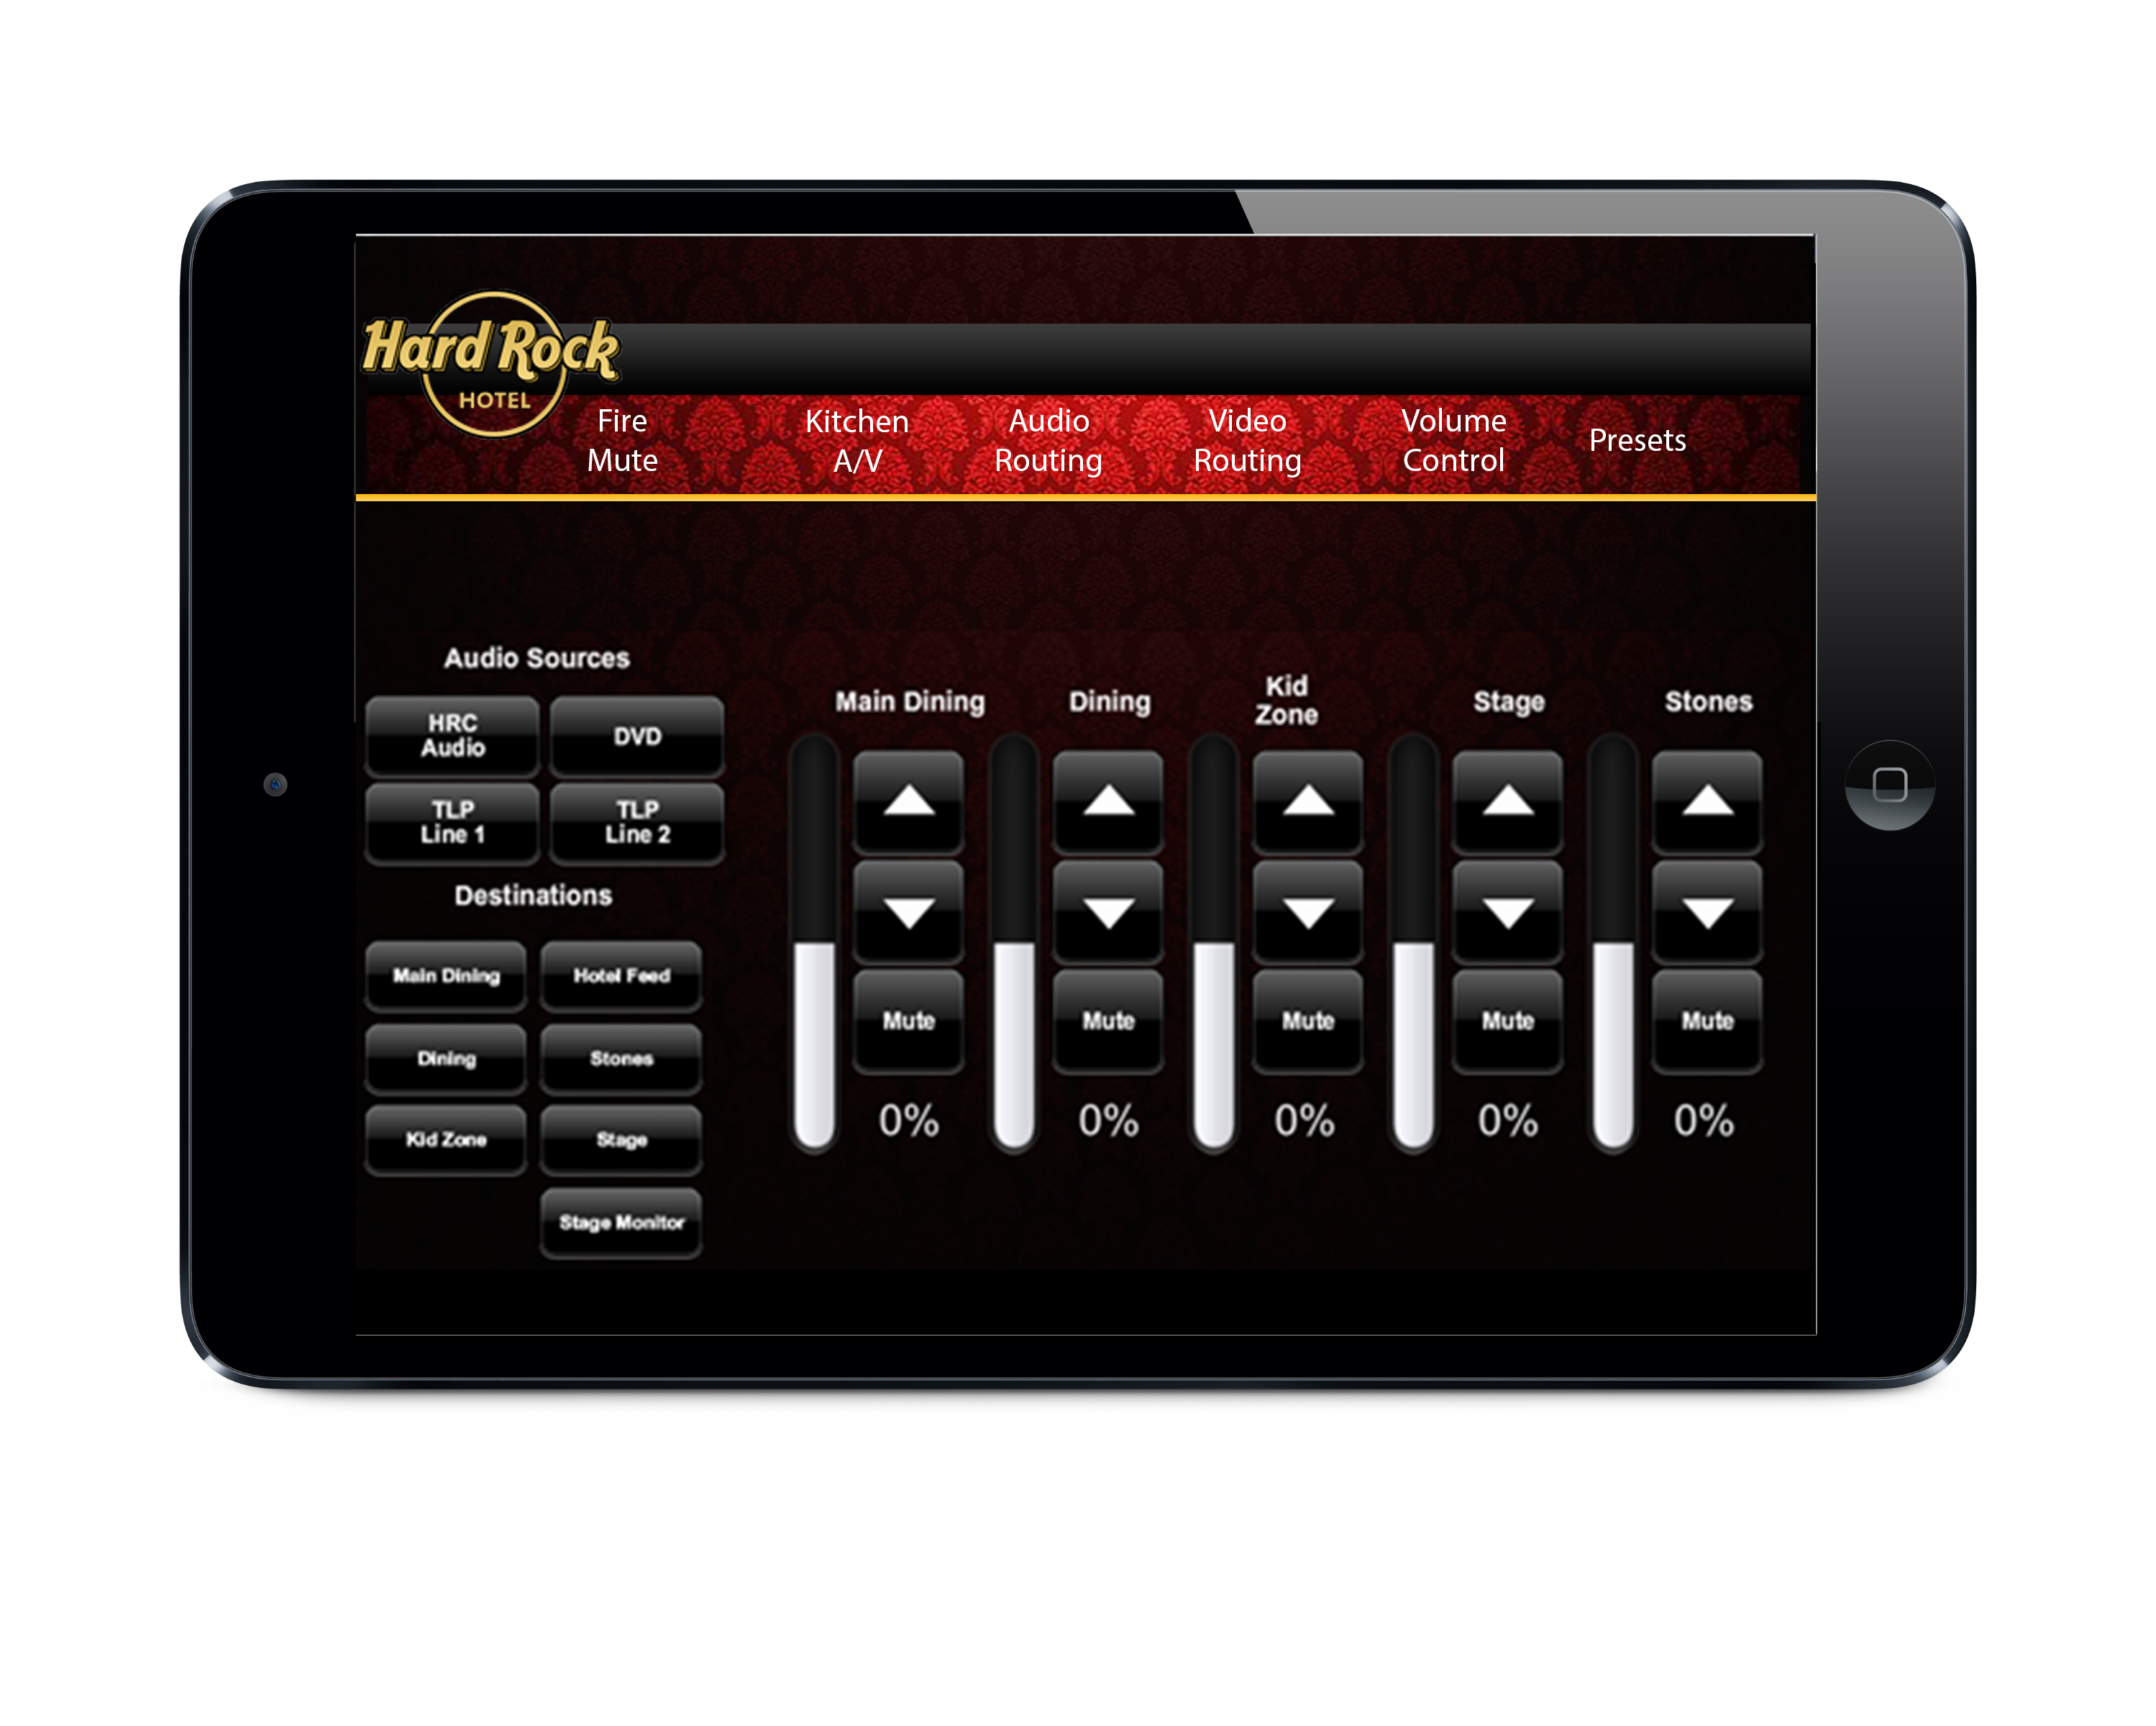 Crestron iPad design for Loews Hard Rock Hotel @ Universal Studios, Orlando FL.   #AscendStudios, www.AscendStudios.com